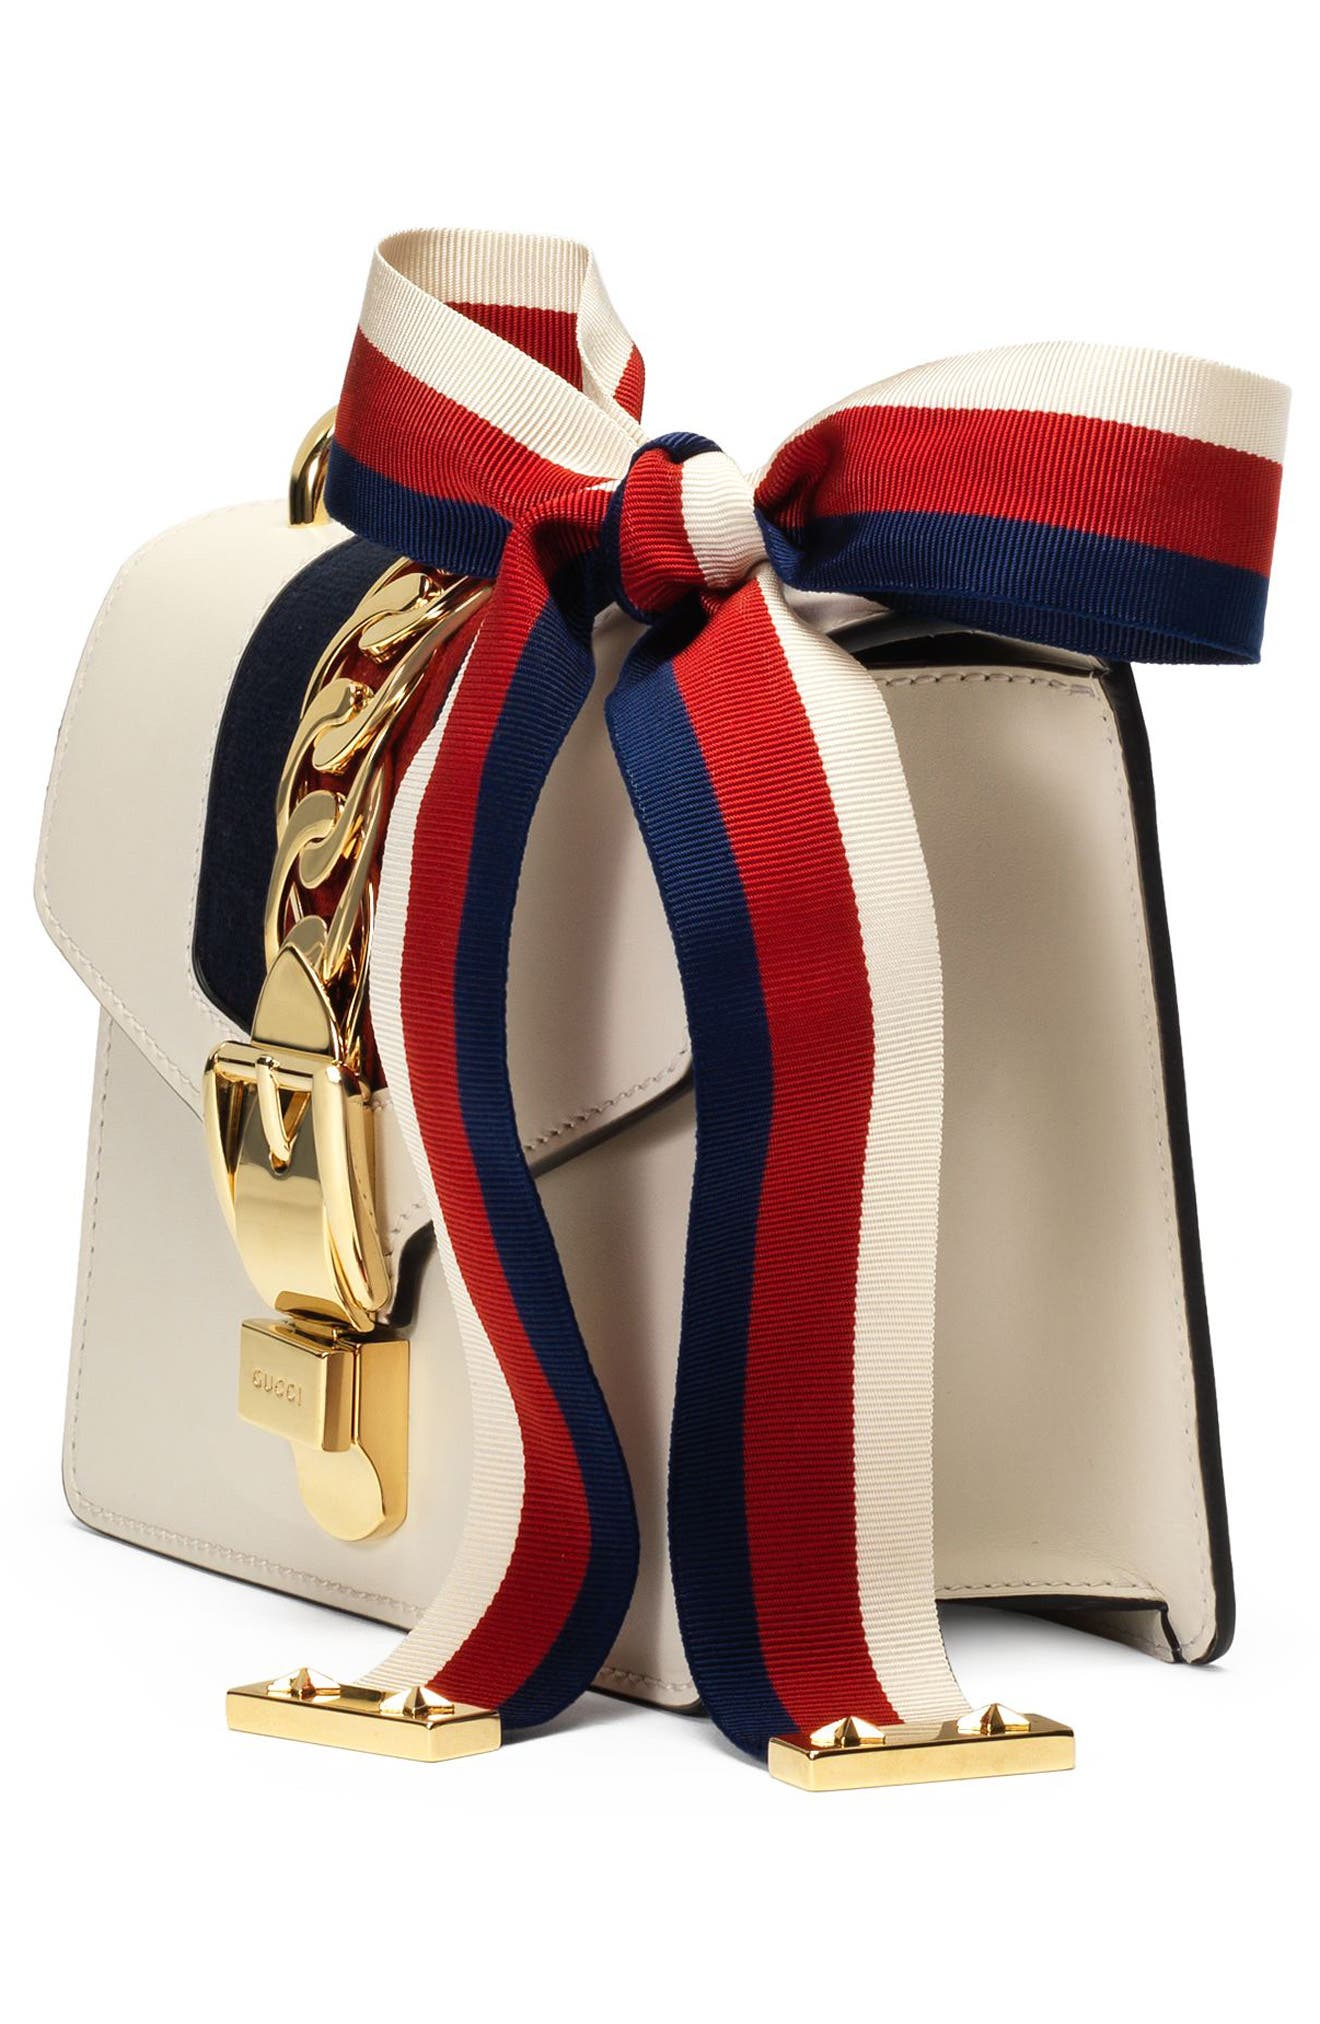 GUCCI, Mini Sylvie Leather Shoulder Bag, Alternate thumbnail 4, color, WHITE/ BLUE/ HIBISCUS RED